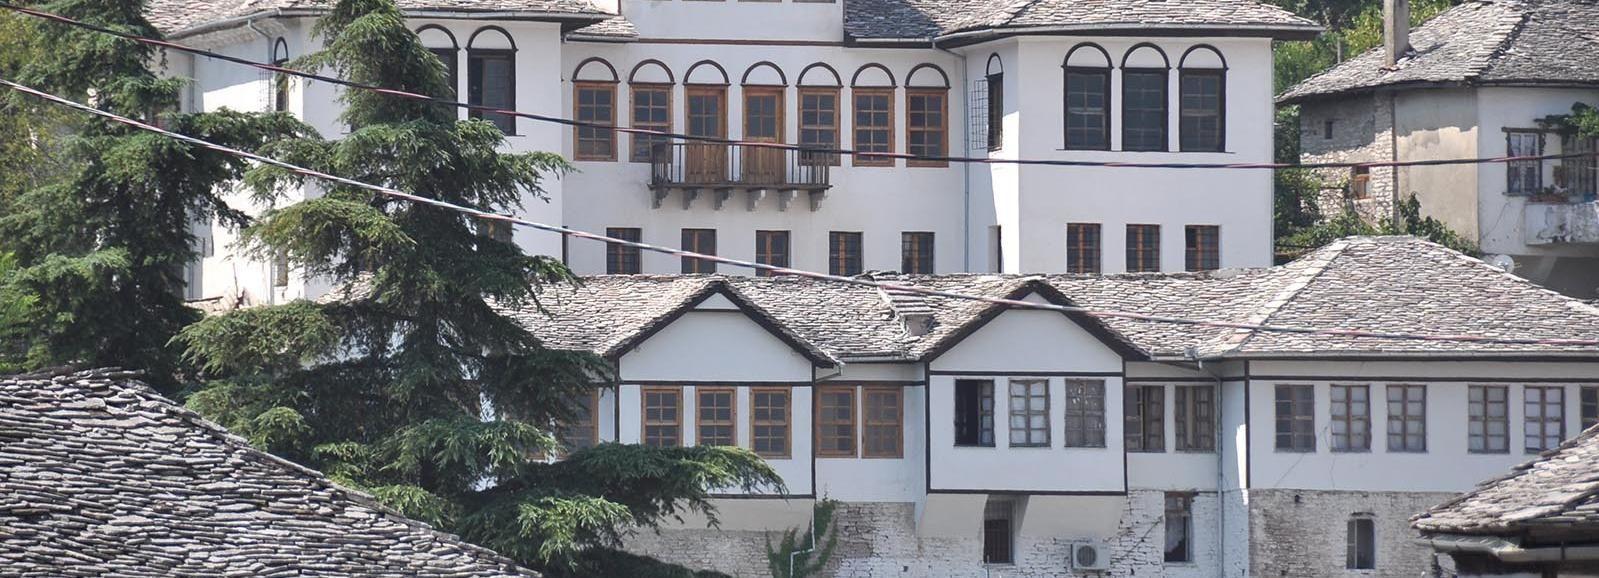 Gjirokastra Ganztagestour